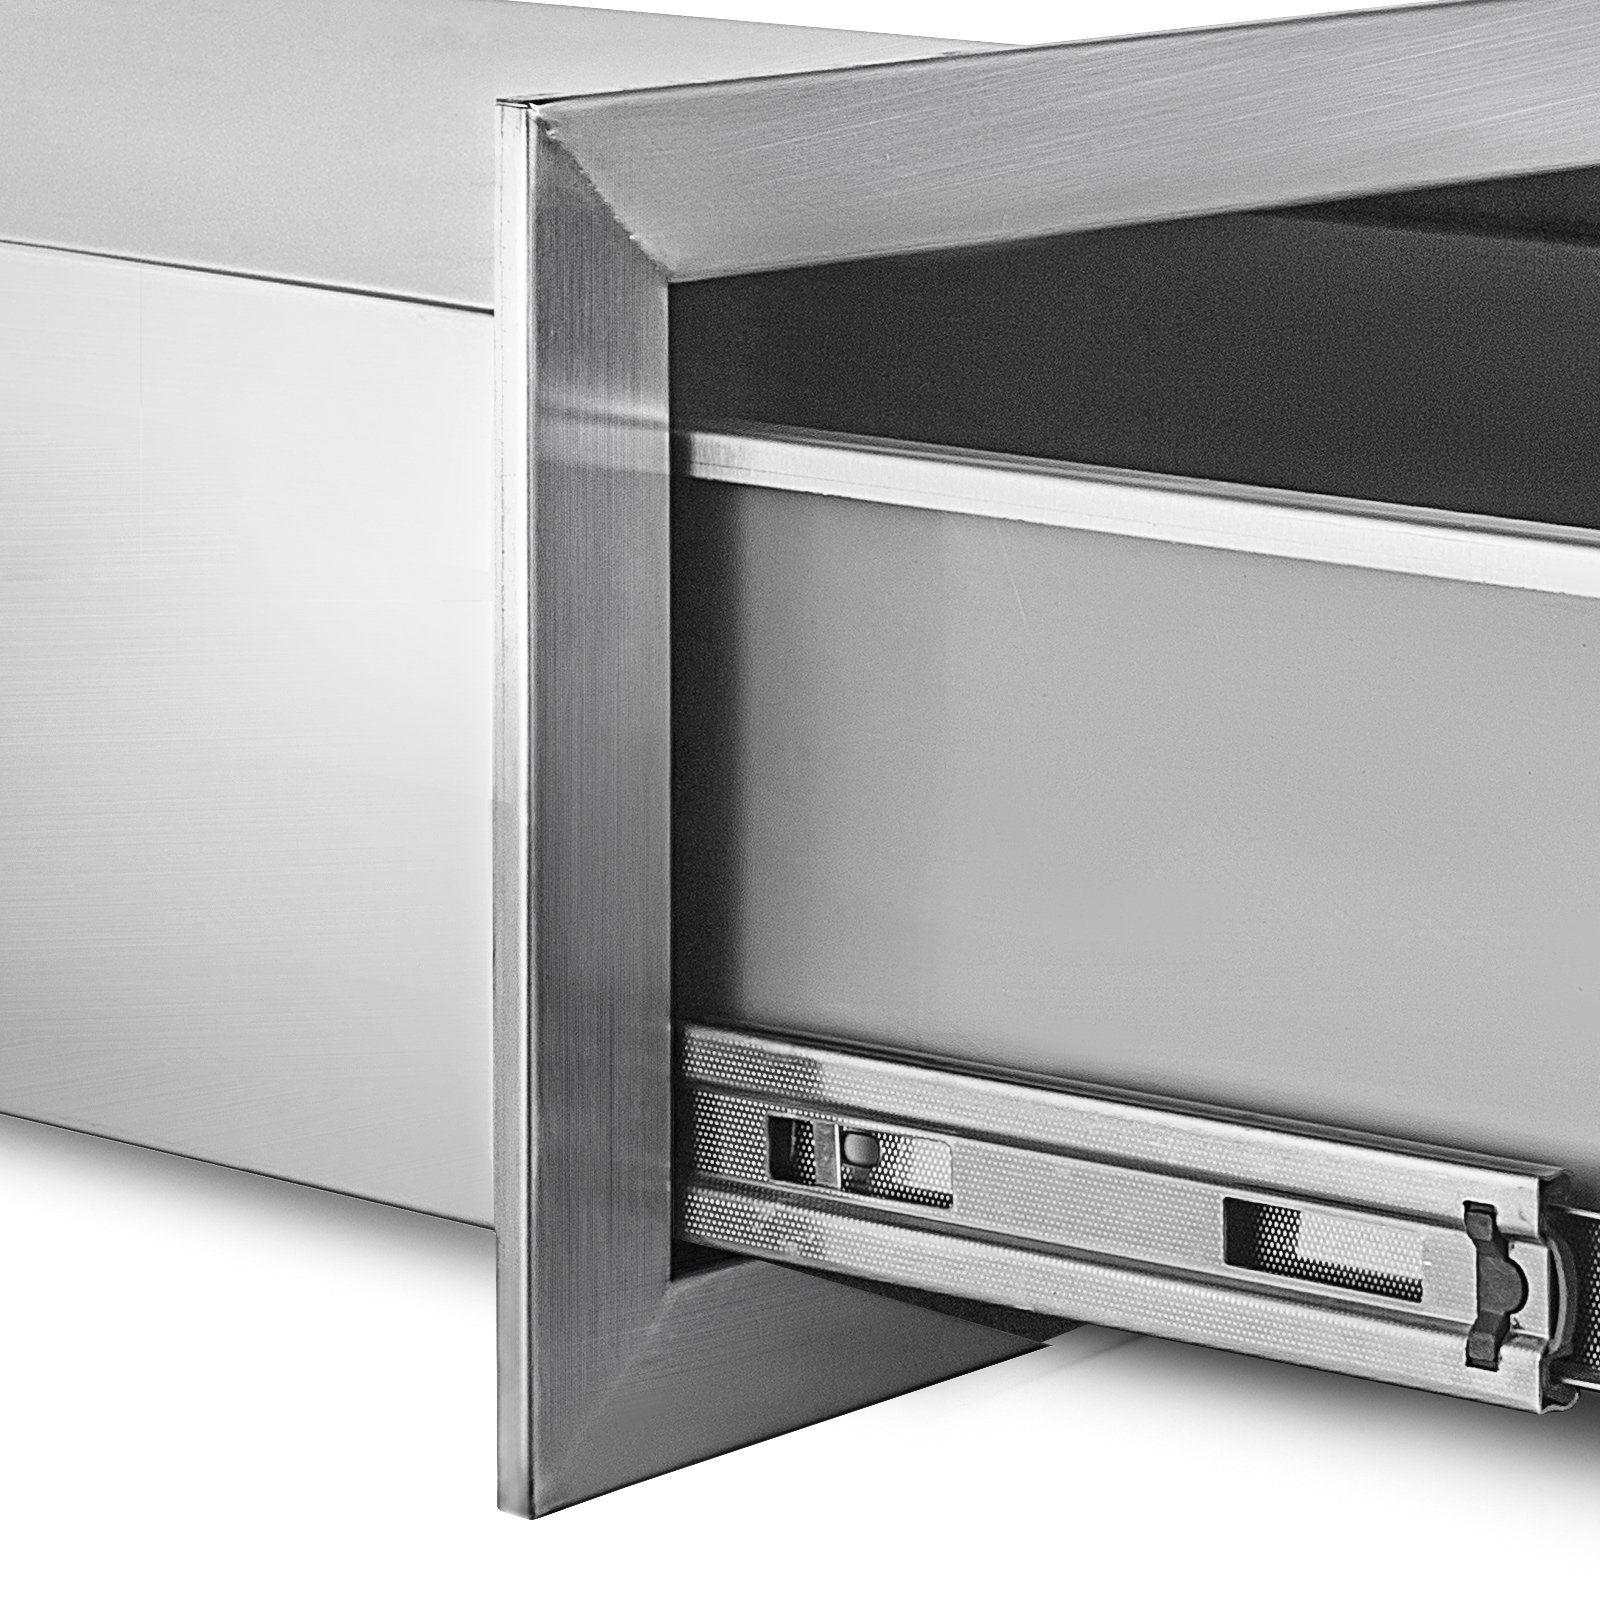 Mophorn Outdoor Kitchen Drawer Stainless Steel Bbq Island Drawer Storage With Chrome Handle Double Access Drawer Island Drawers Storage Drawers Outdoor Storage